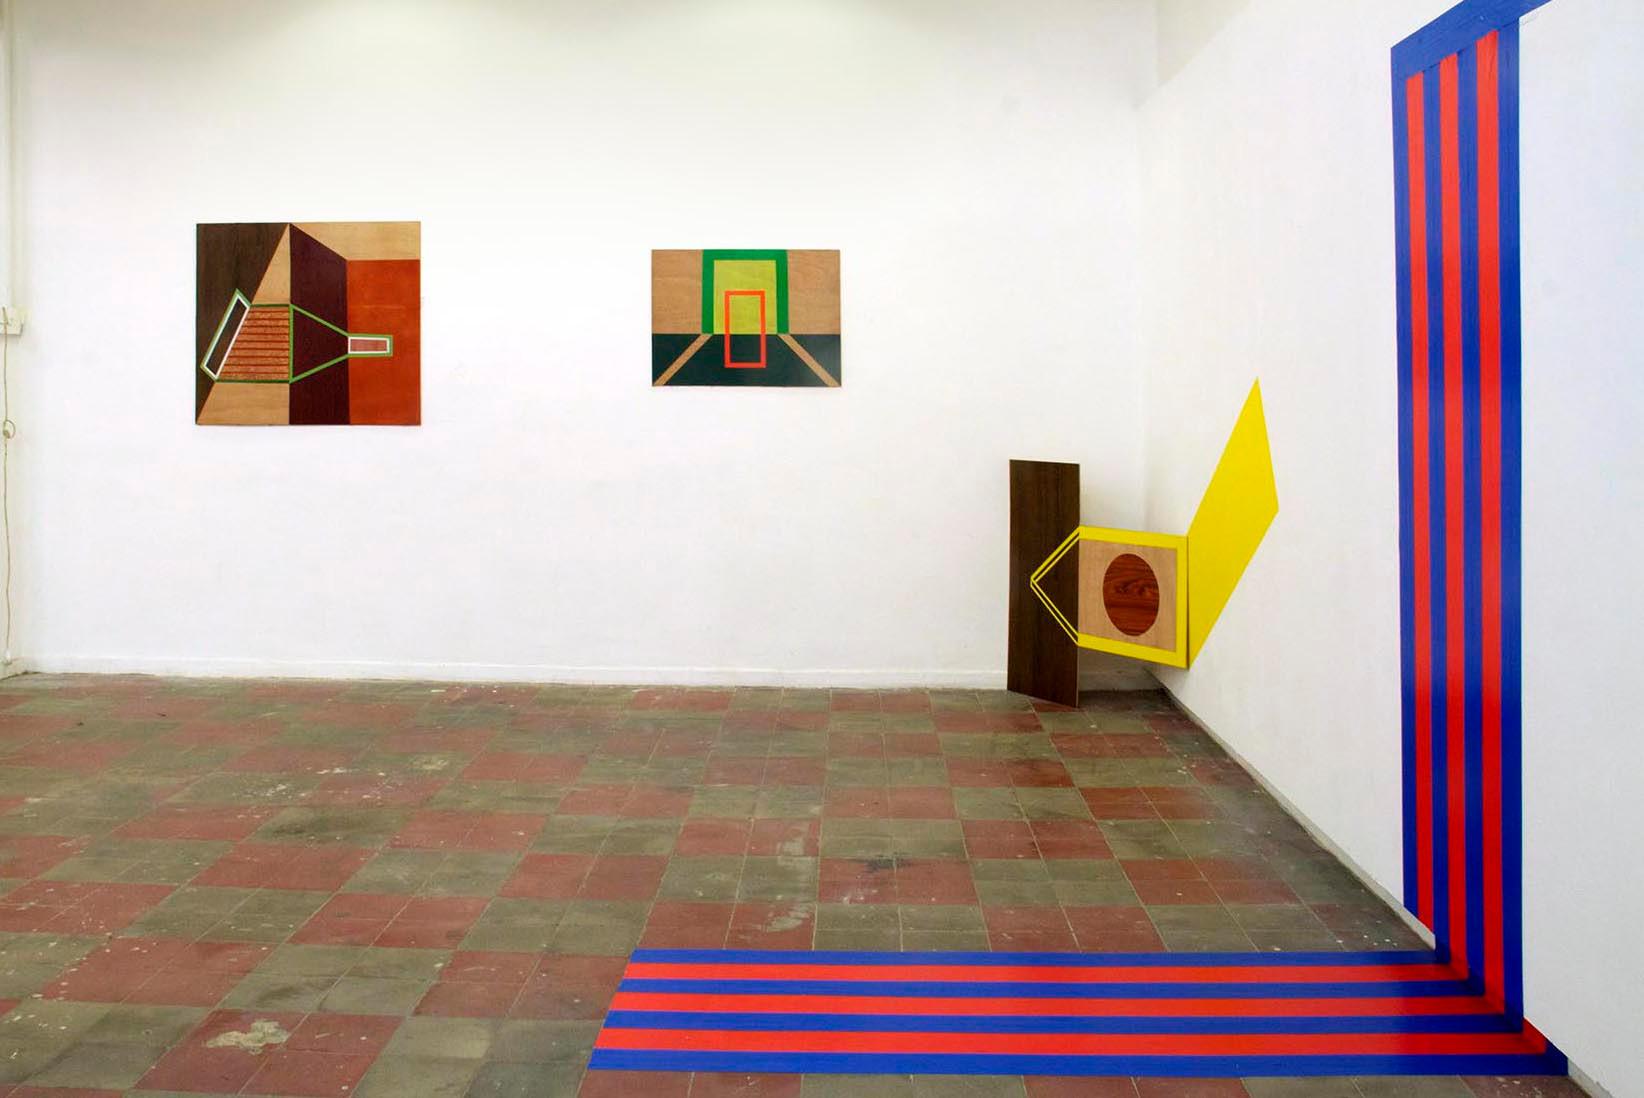 BETWEEN THE LINES, 2014. B.F.A middle exhibition, Shenkar, Tel-Aviv